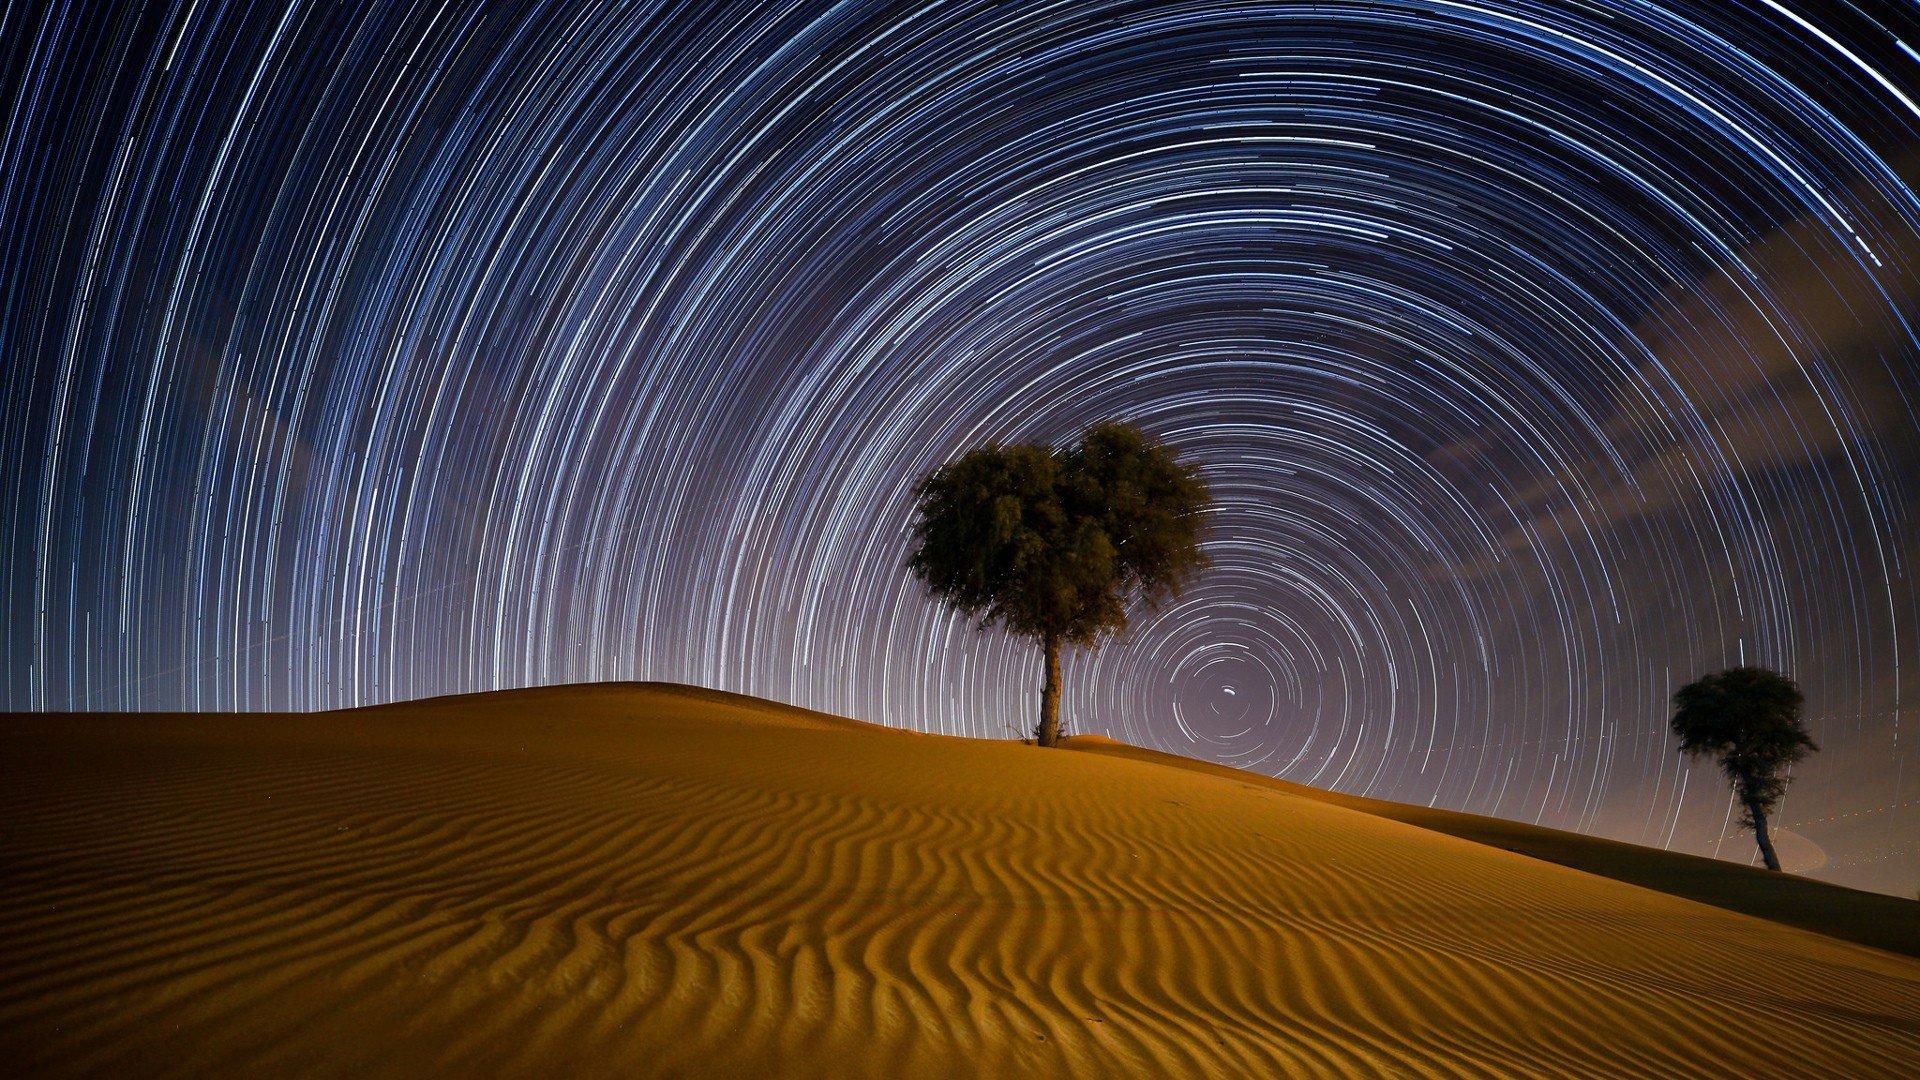 wallpaper : 1920x1080 px, desert, dubai, night, star trails